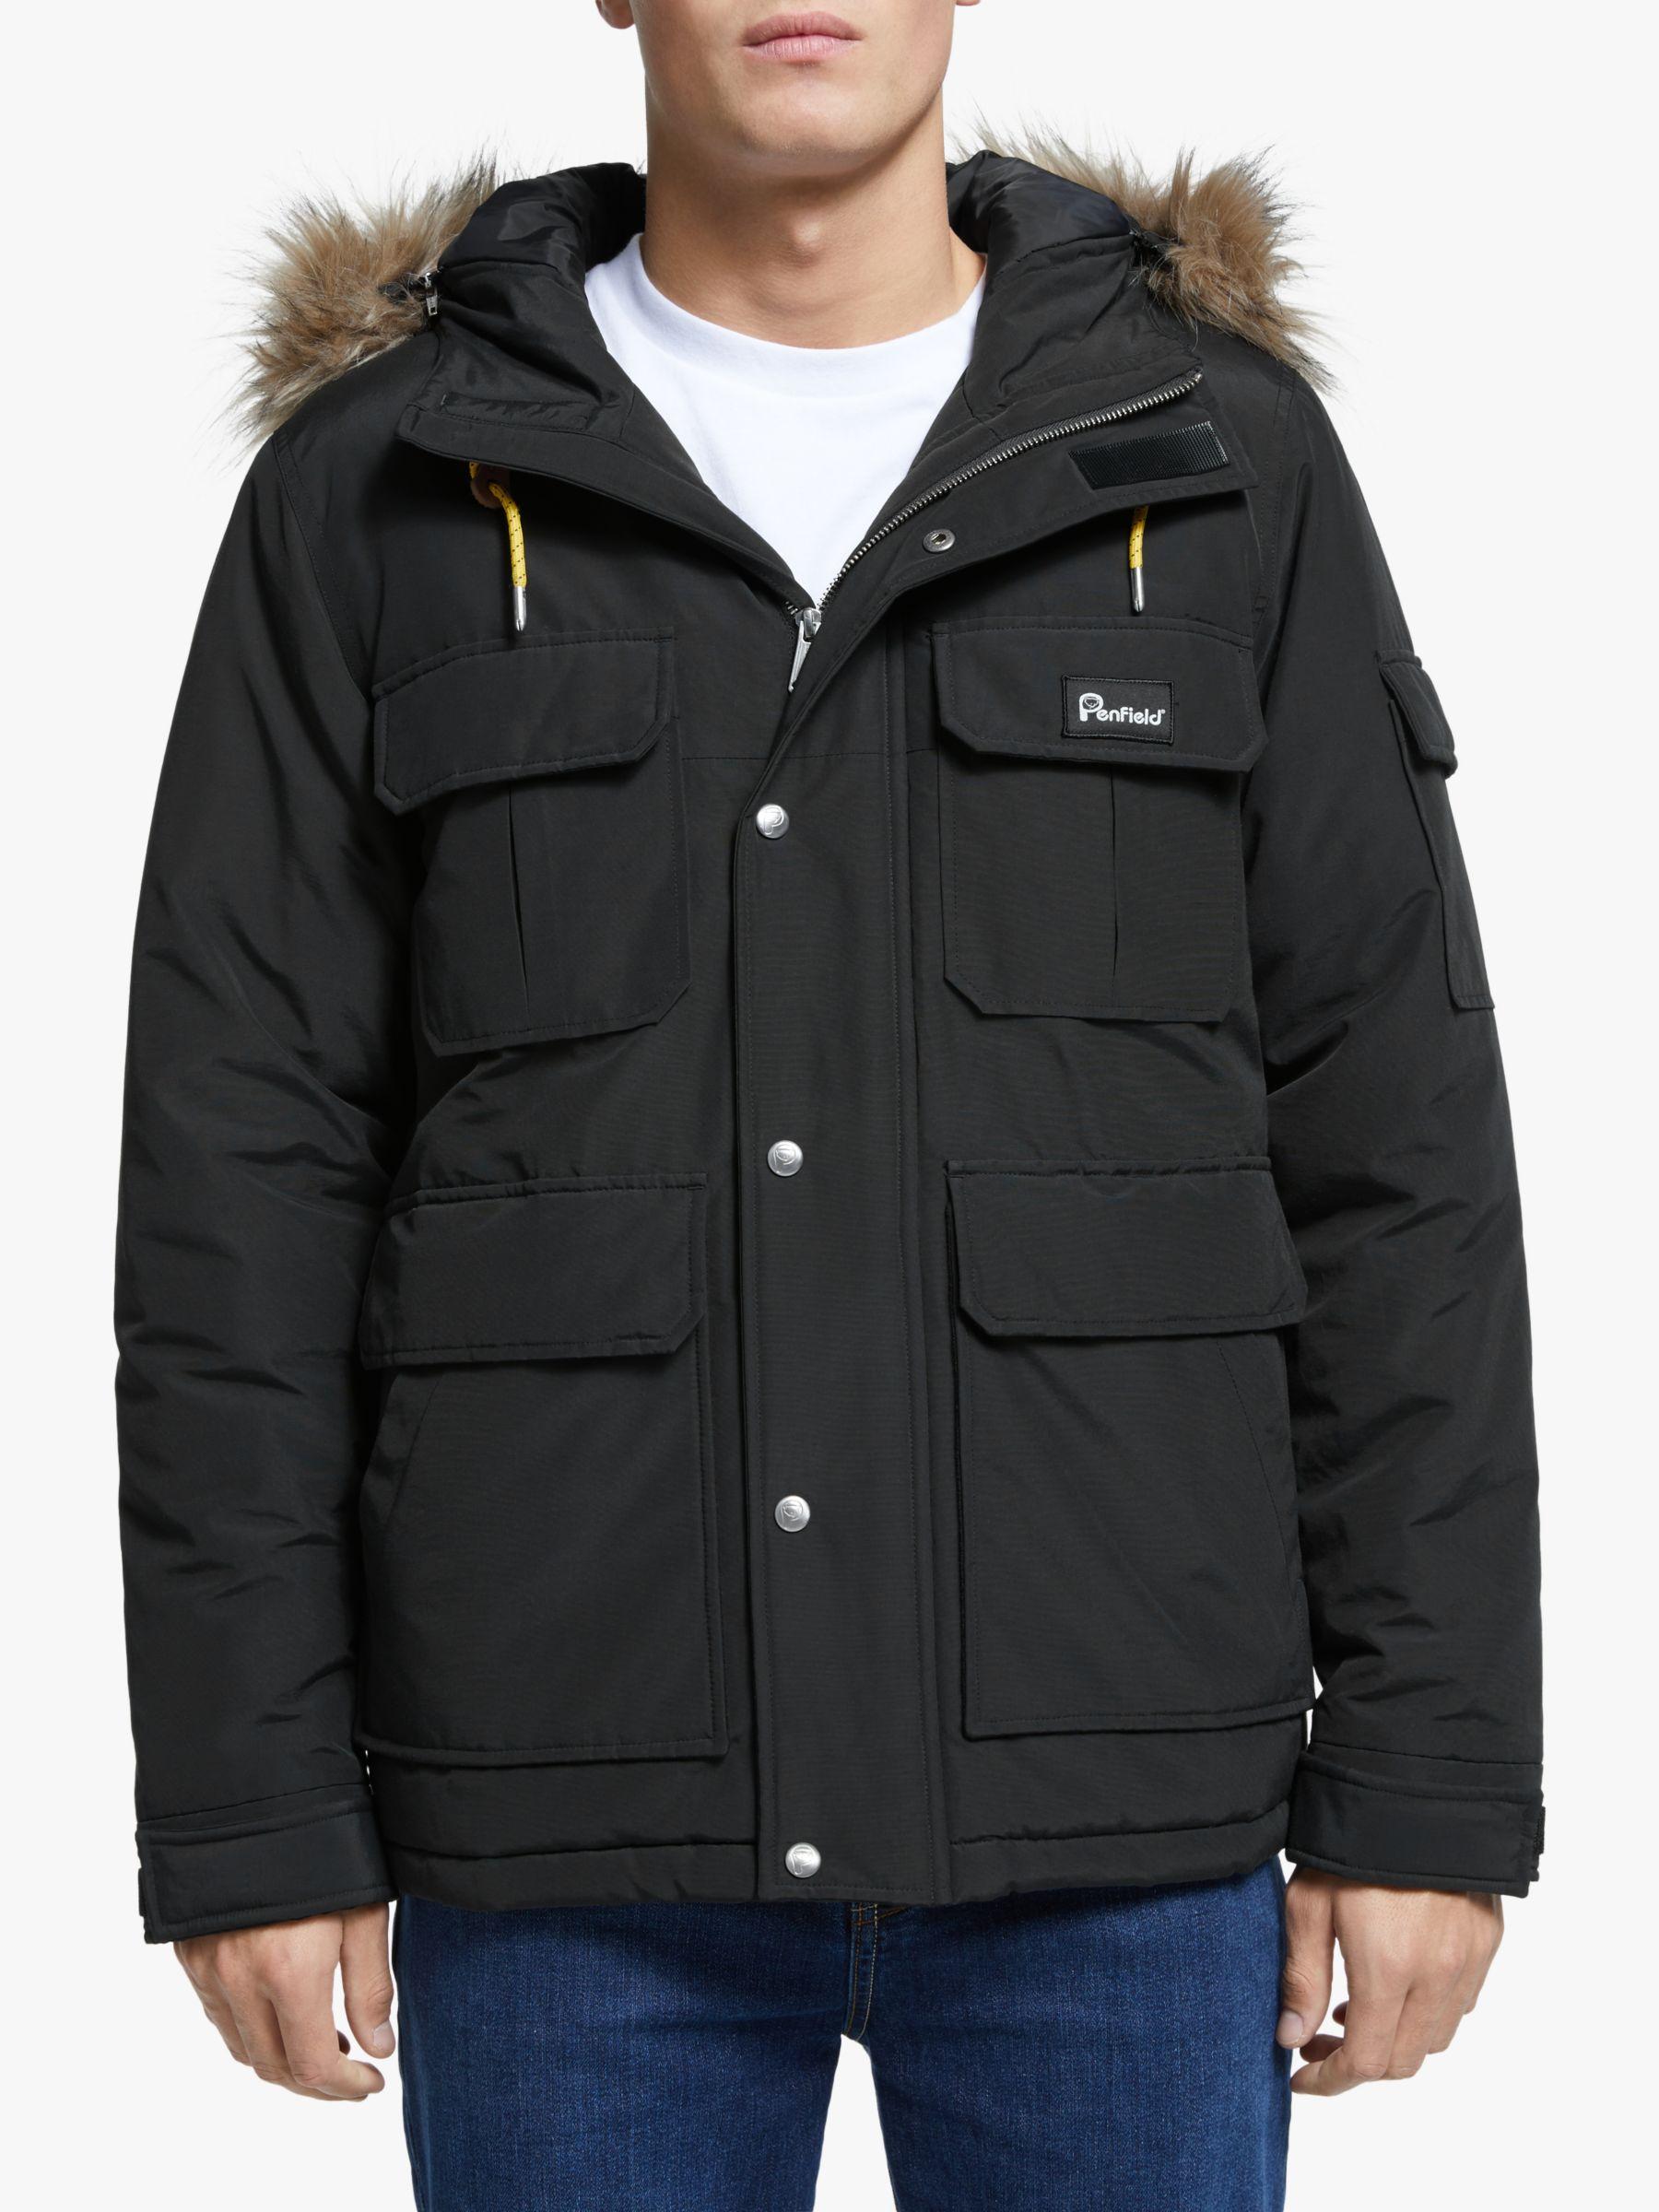 Penfield Penfield Lansing Parka Jacket, Black